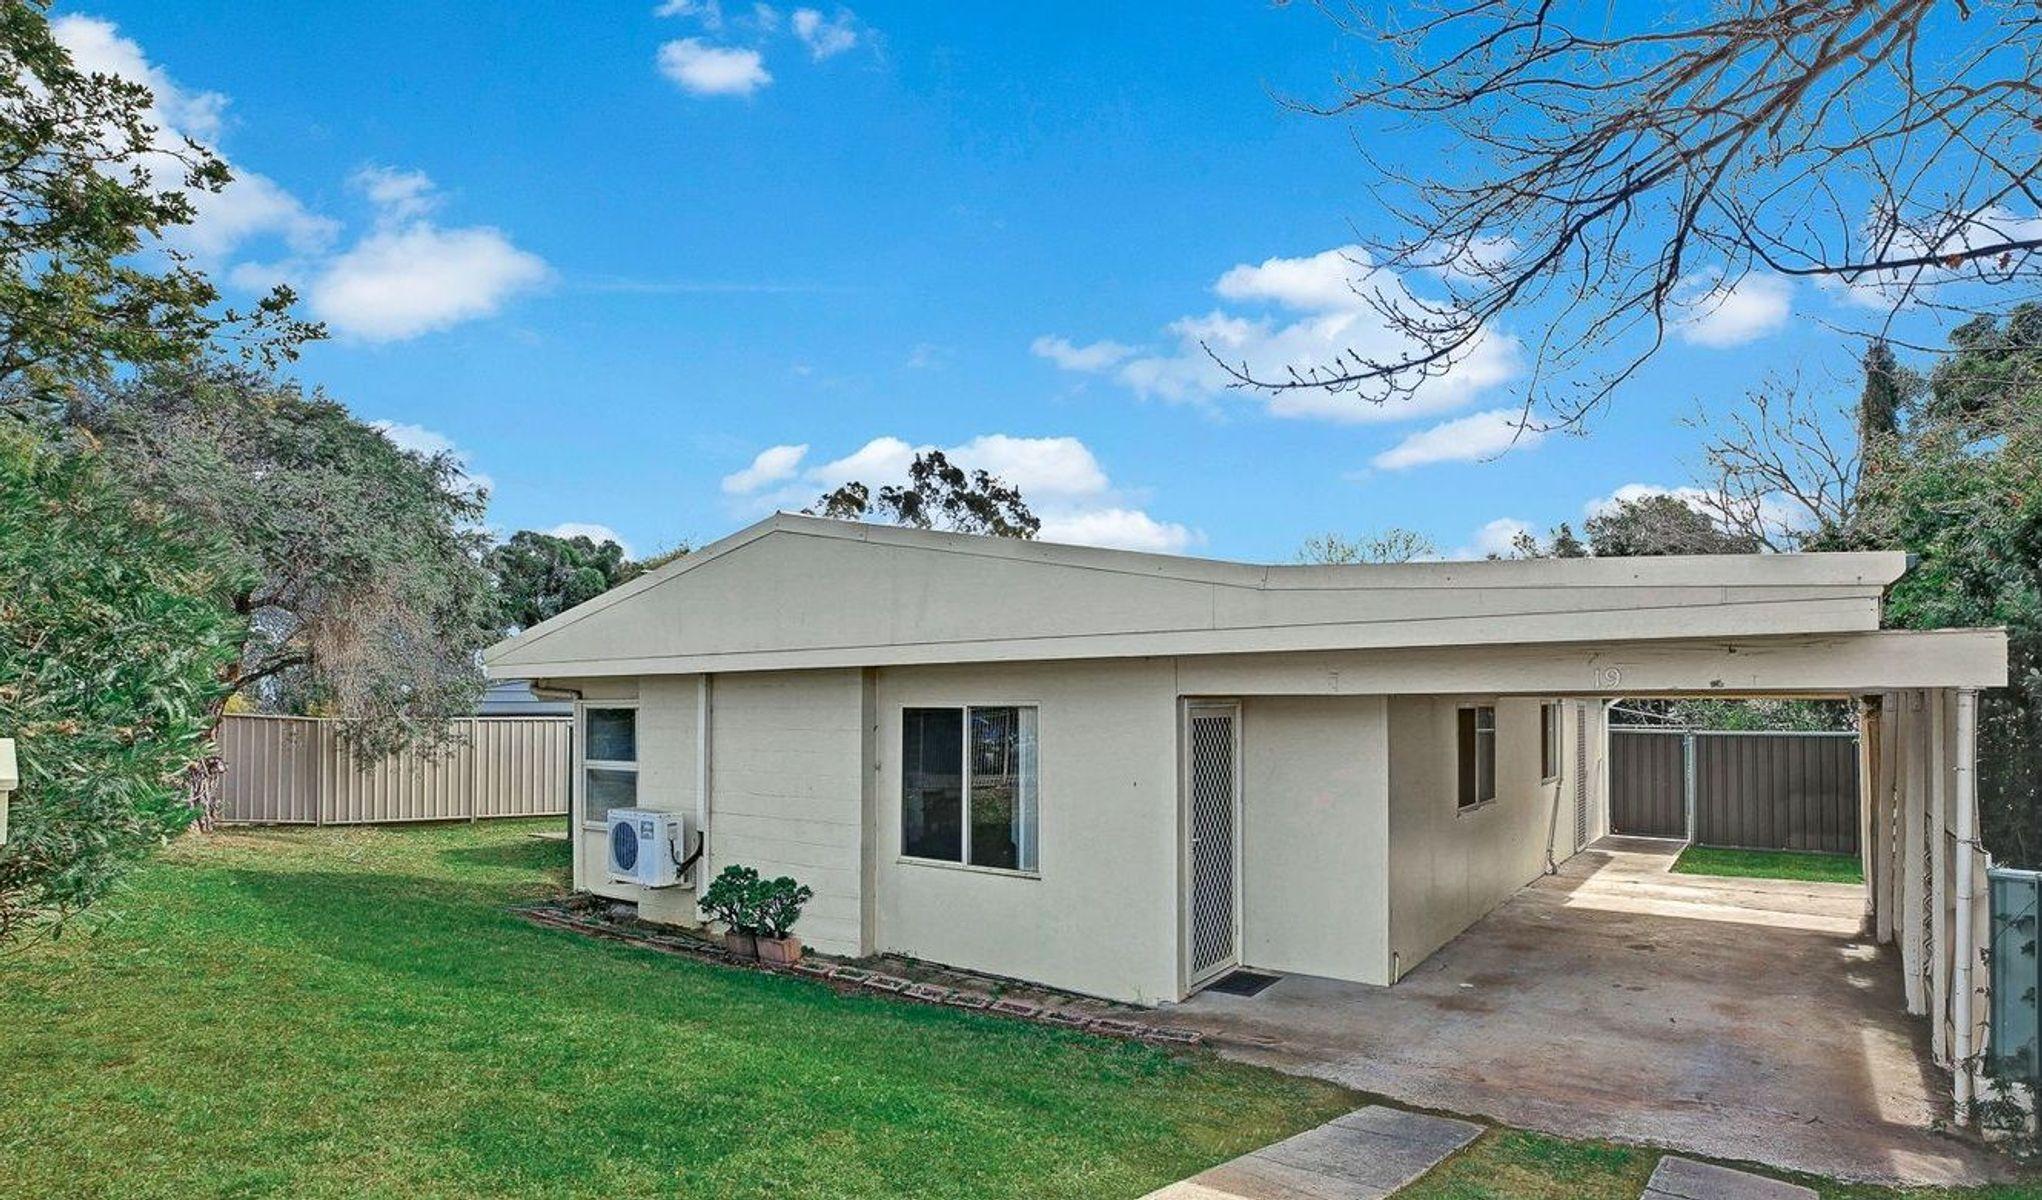 19 Campbellfield Avenue, Bradbury, NSW 2560